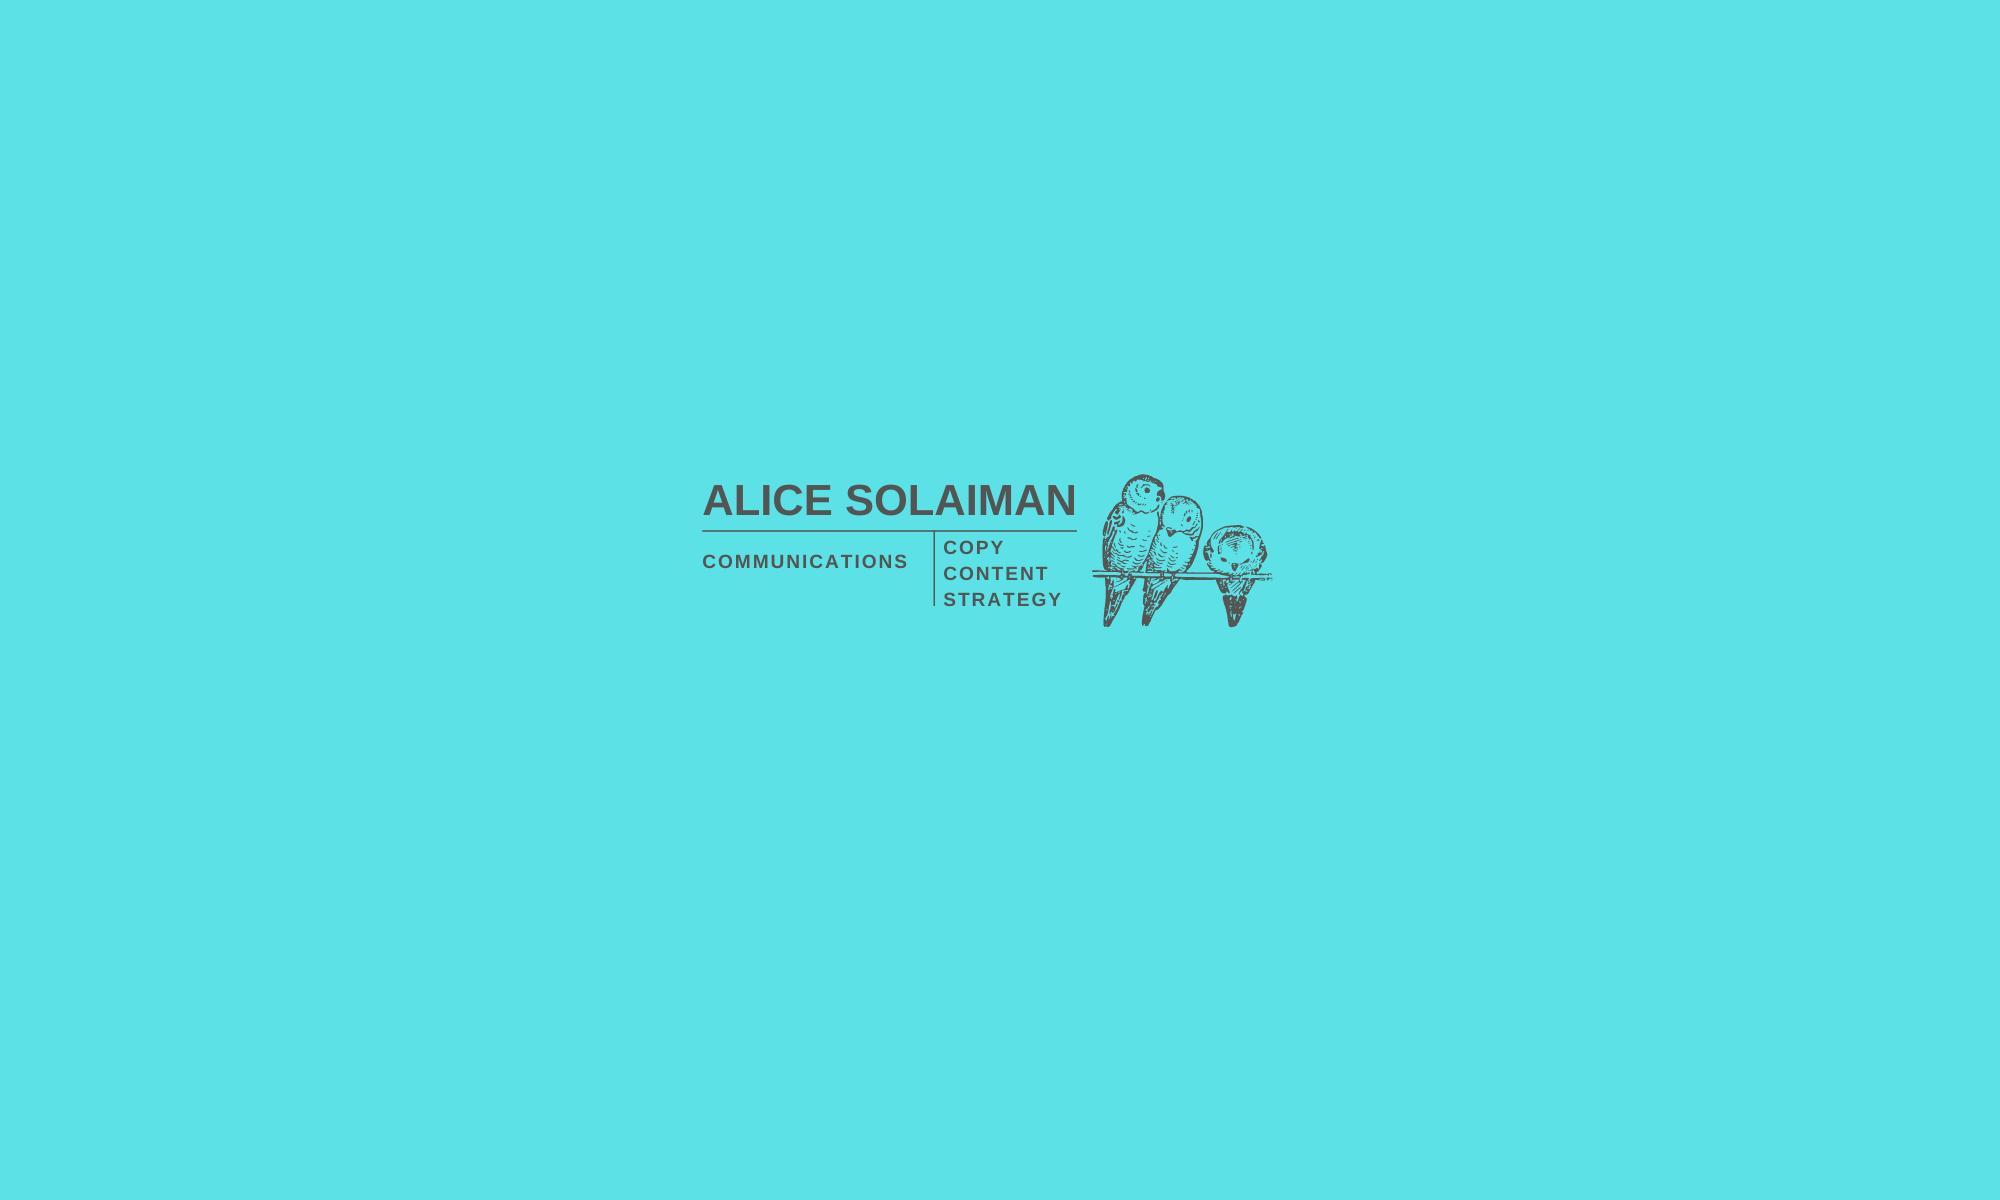 ALICE SOLAIMAN